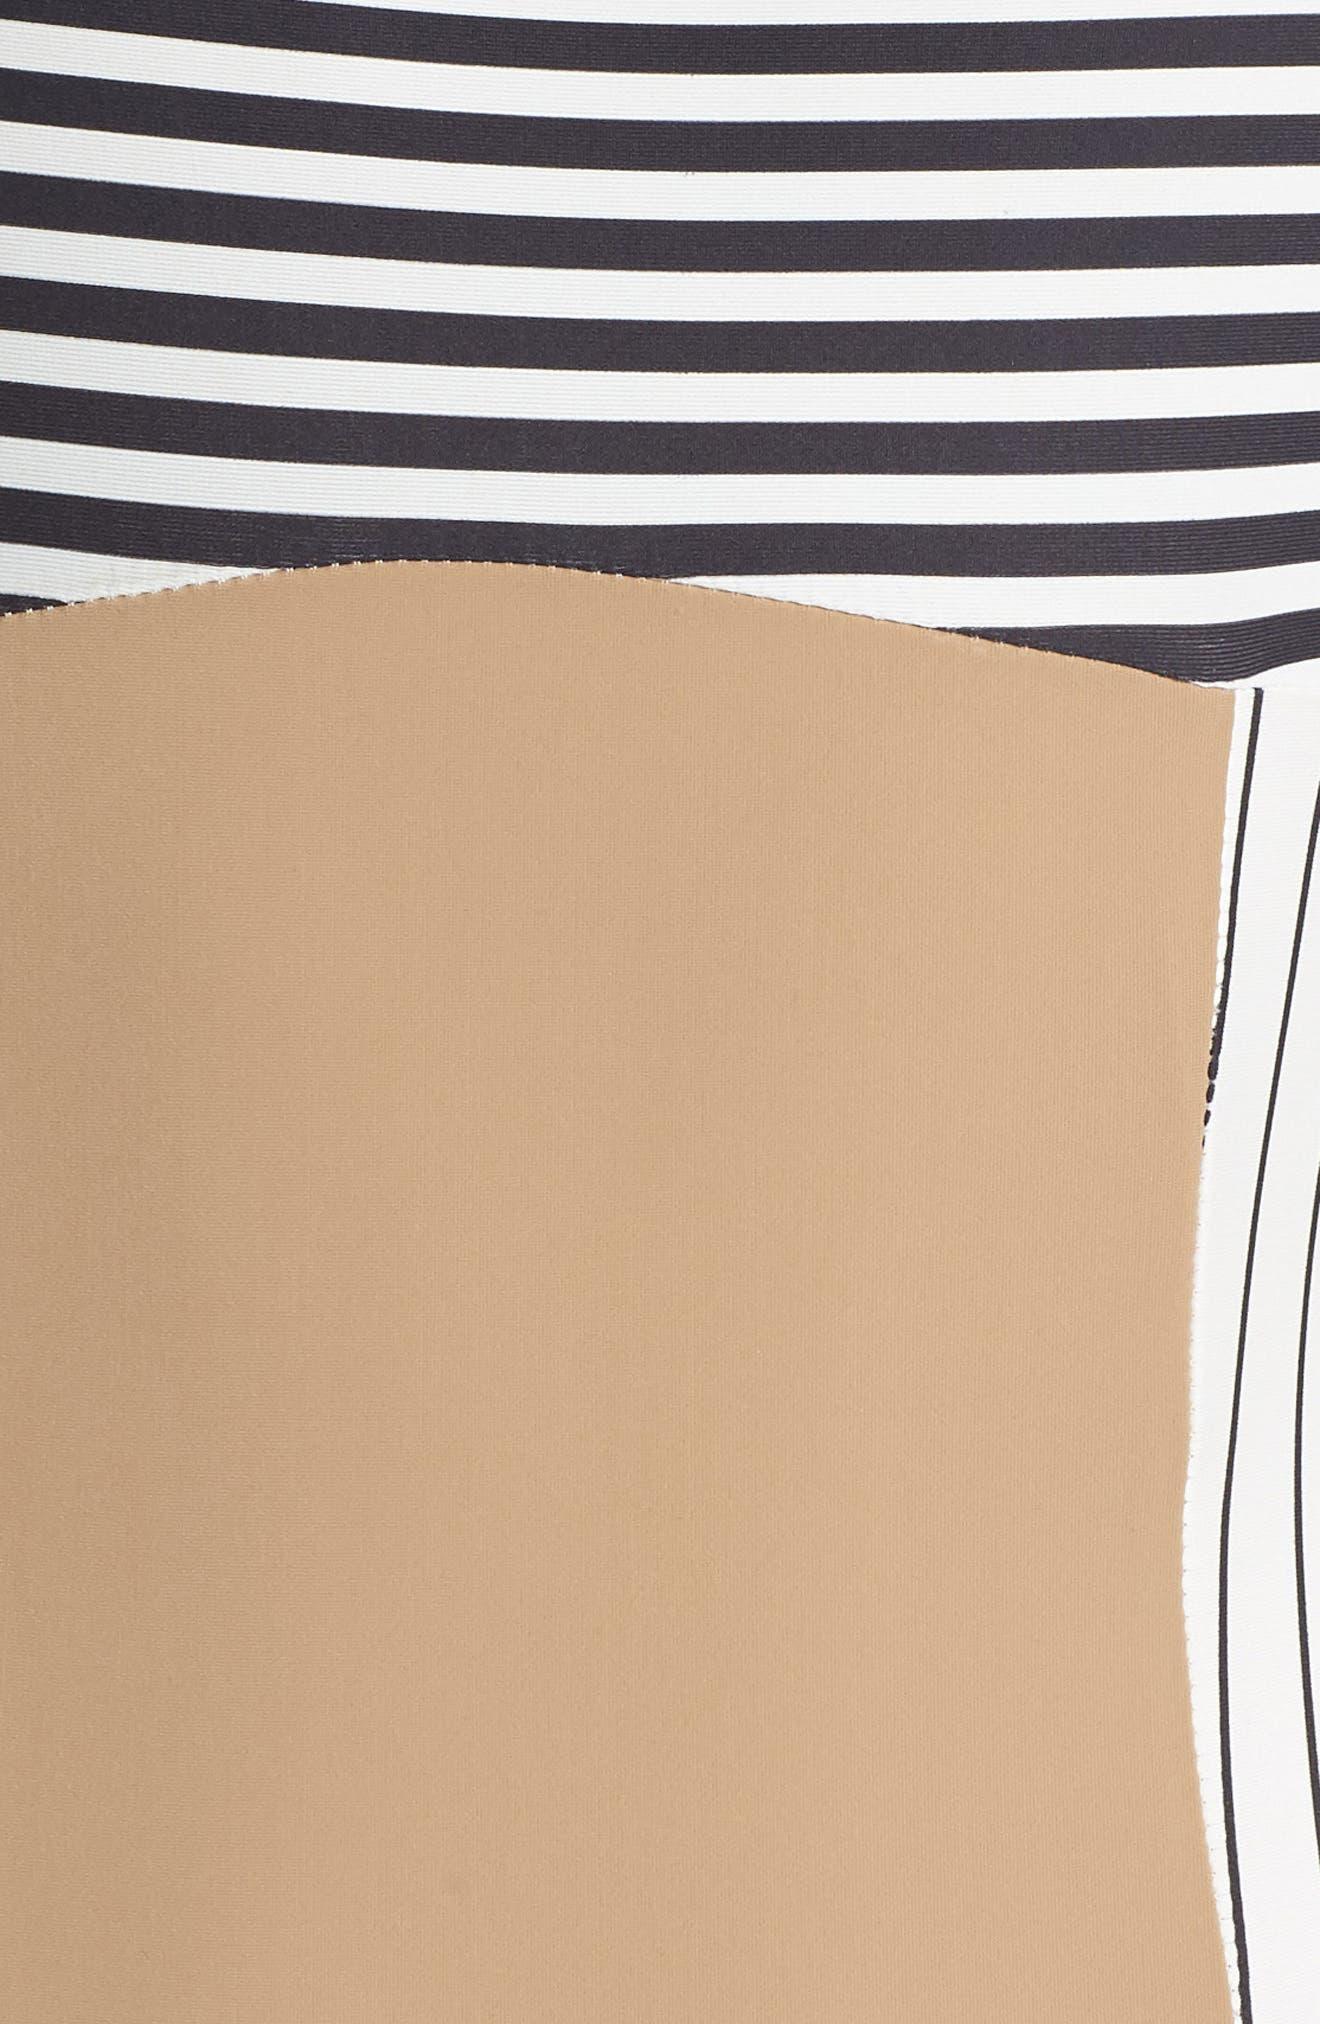 Finn One-Piece Swimsuit,                             Alternate thumbnail 5, color,                             250